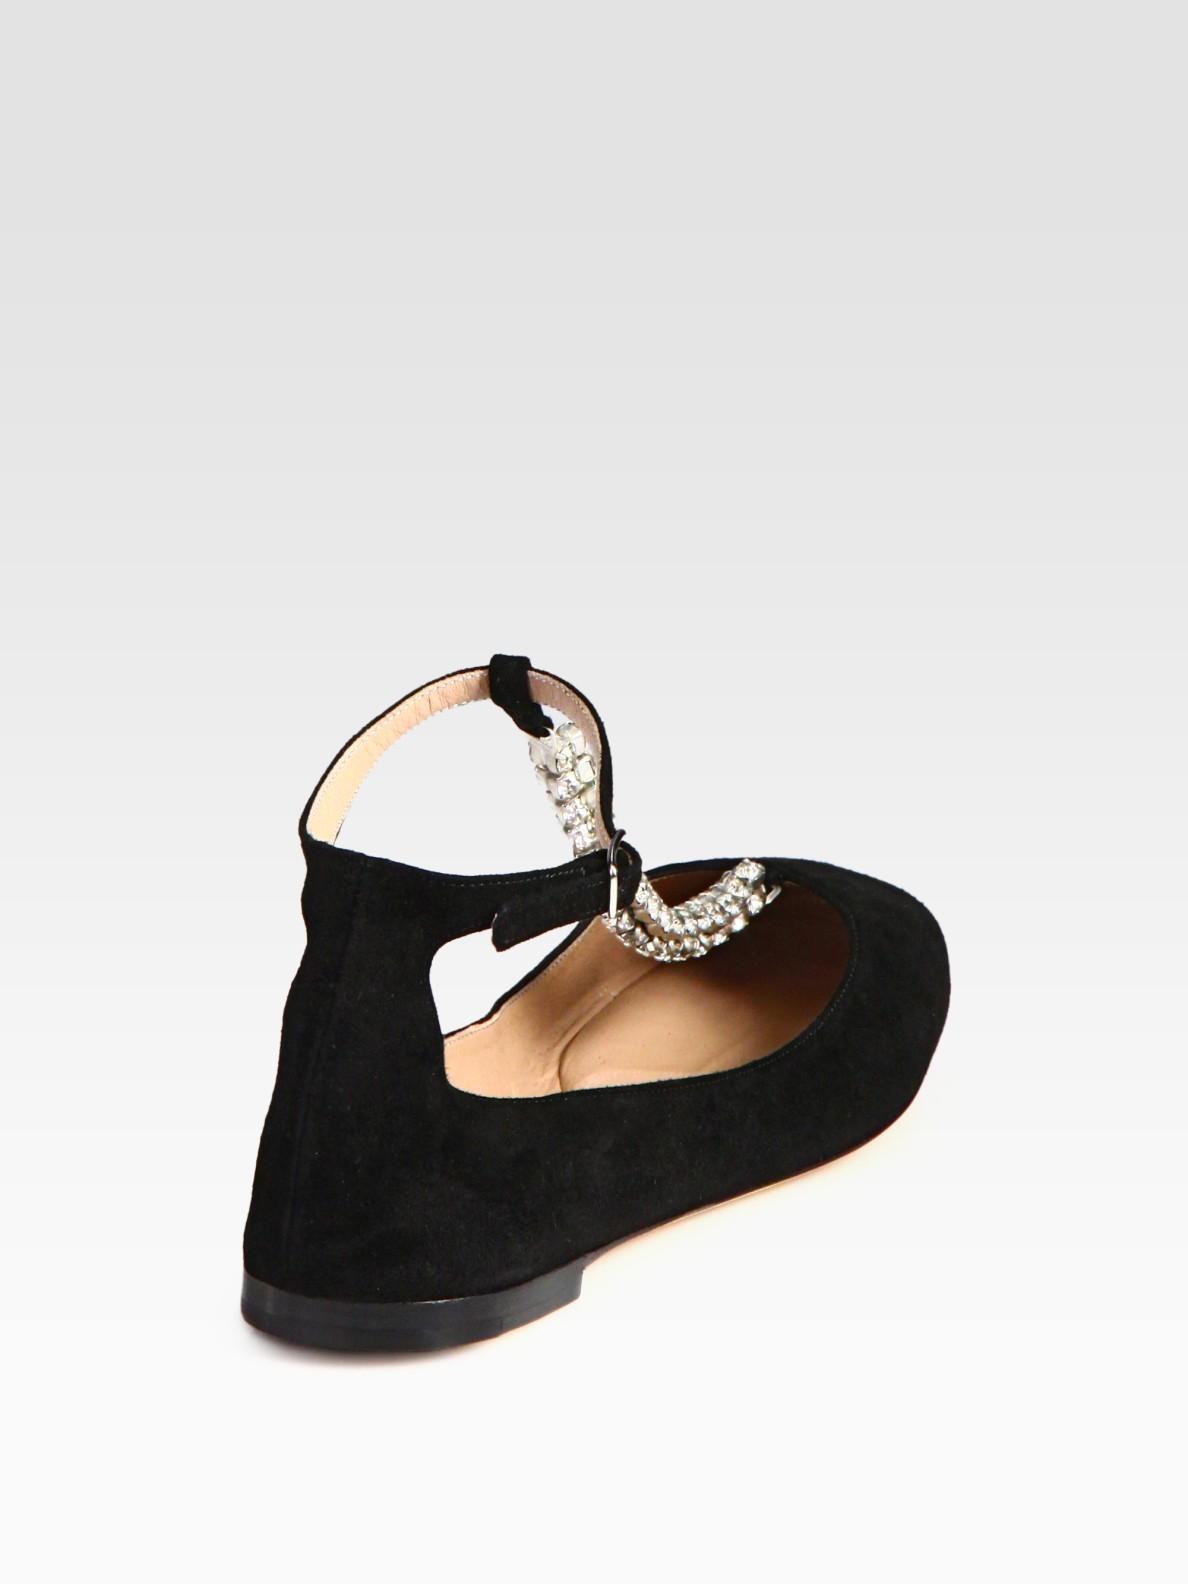 3725fdd483e Lyst - Chloé Embellished Suede Tstrap Ballet Flats in Black